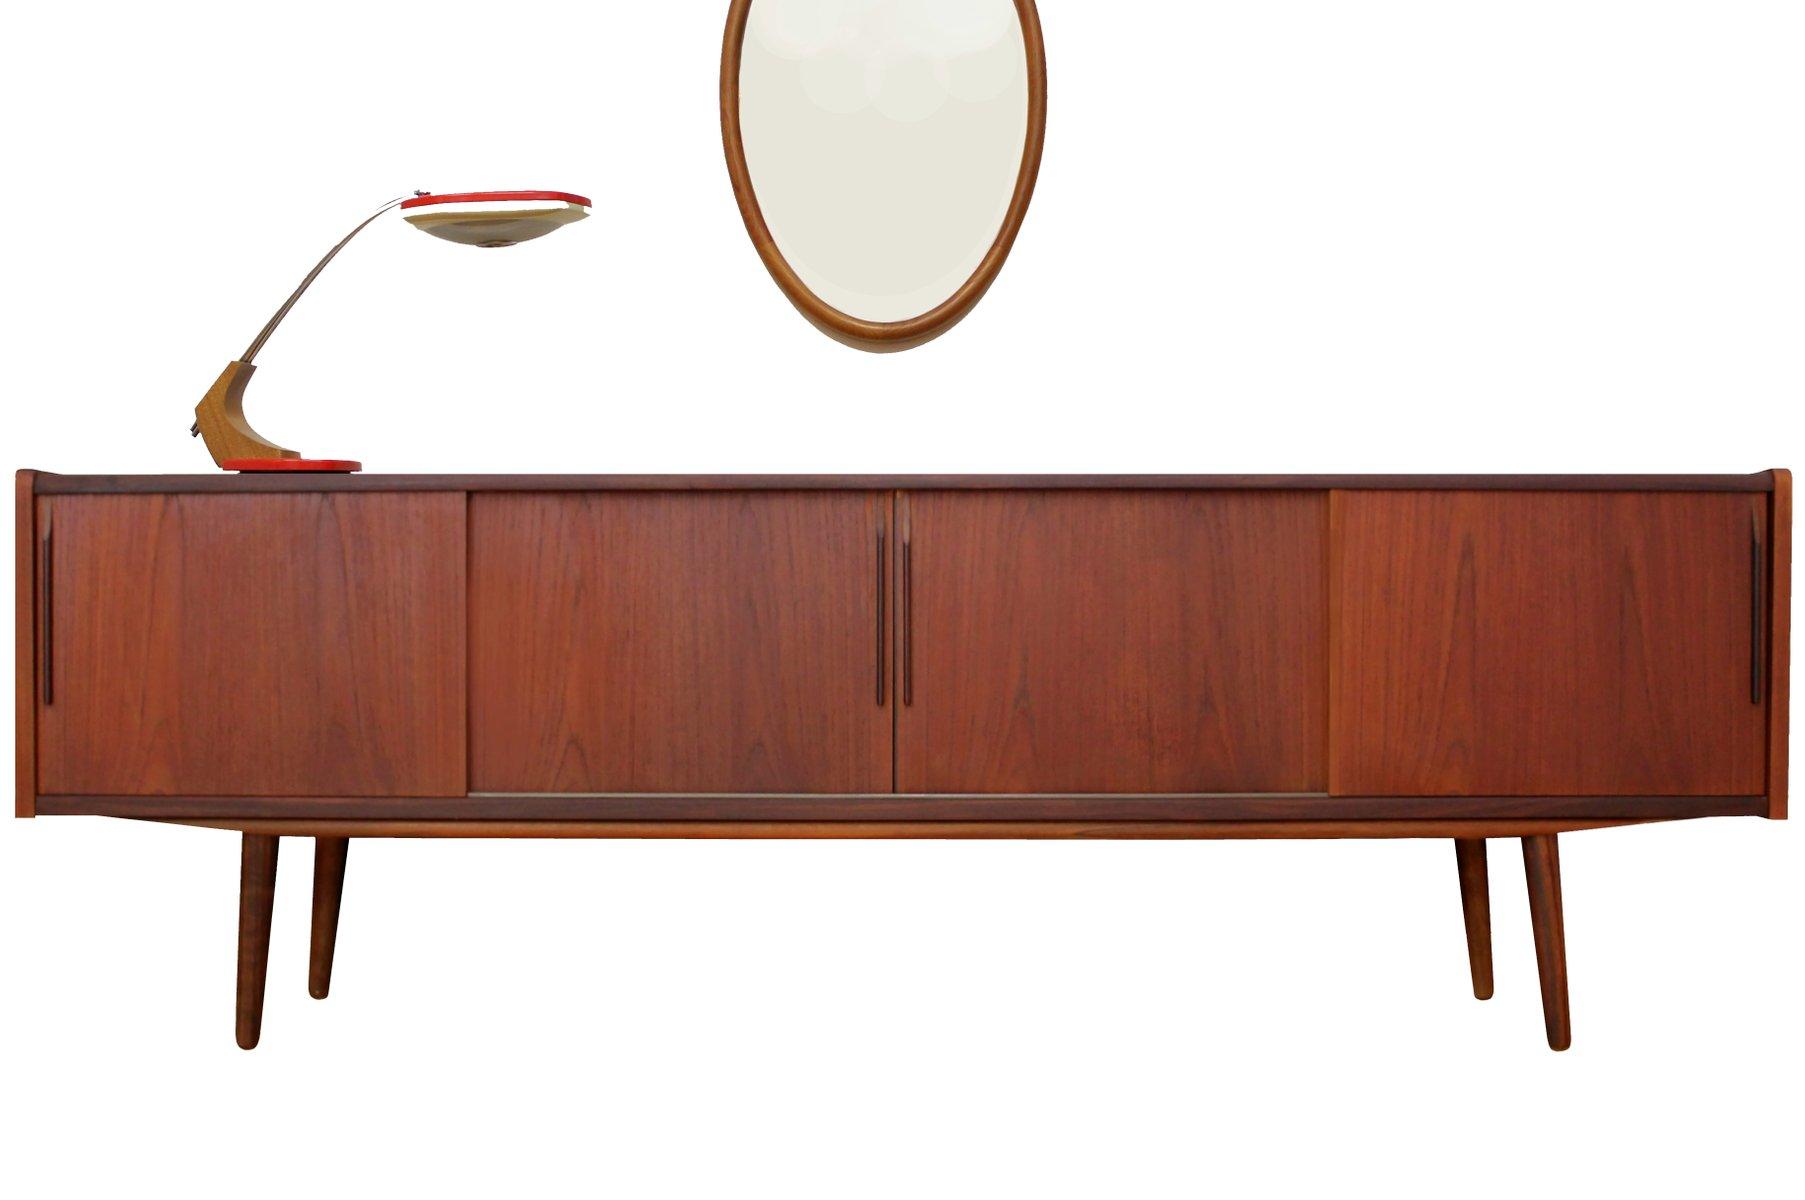 niedriges skandinavisches teak sideboard 1950er bei pamono kaufen. Black Bedroom Furniture Sets. Home Design Ideas